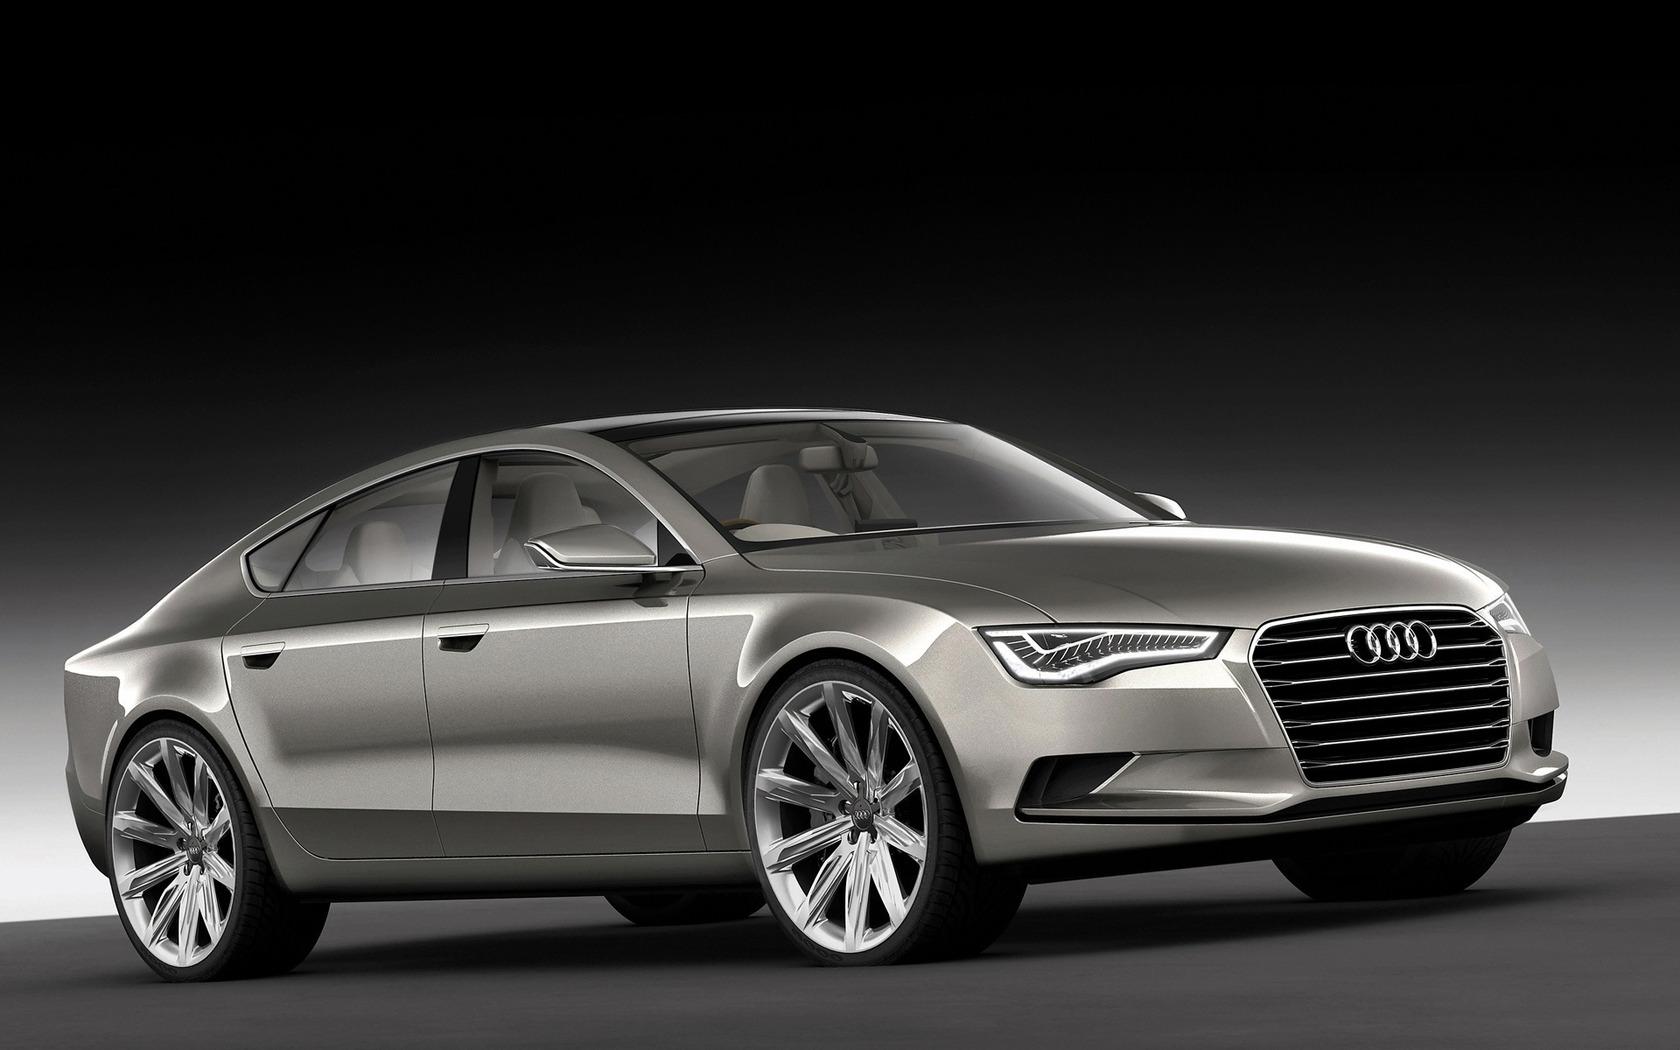 Audi A3 wallpaper 1537 1680x1050